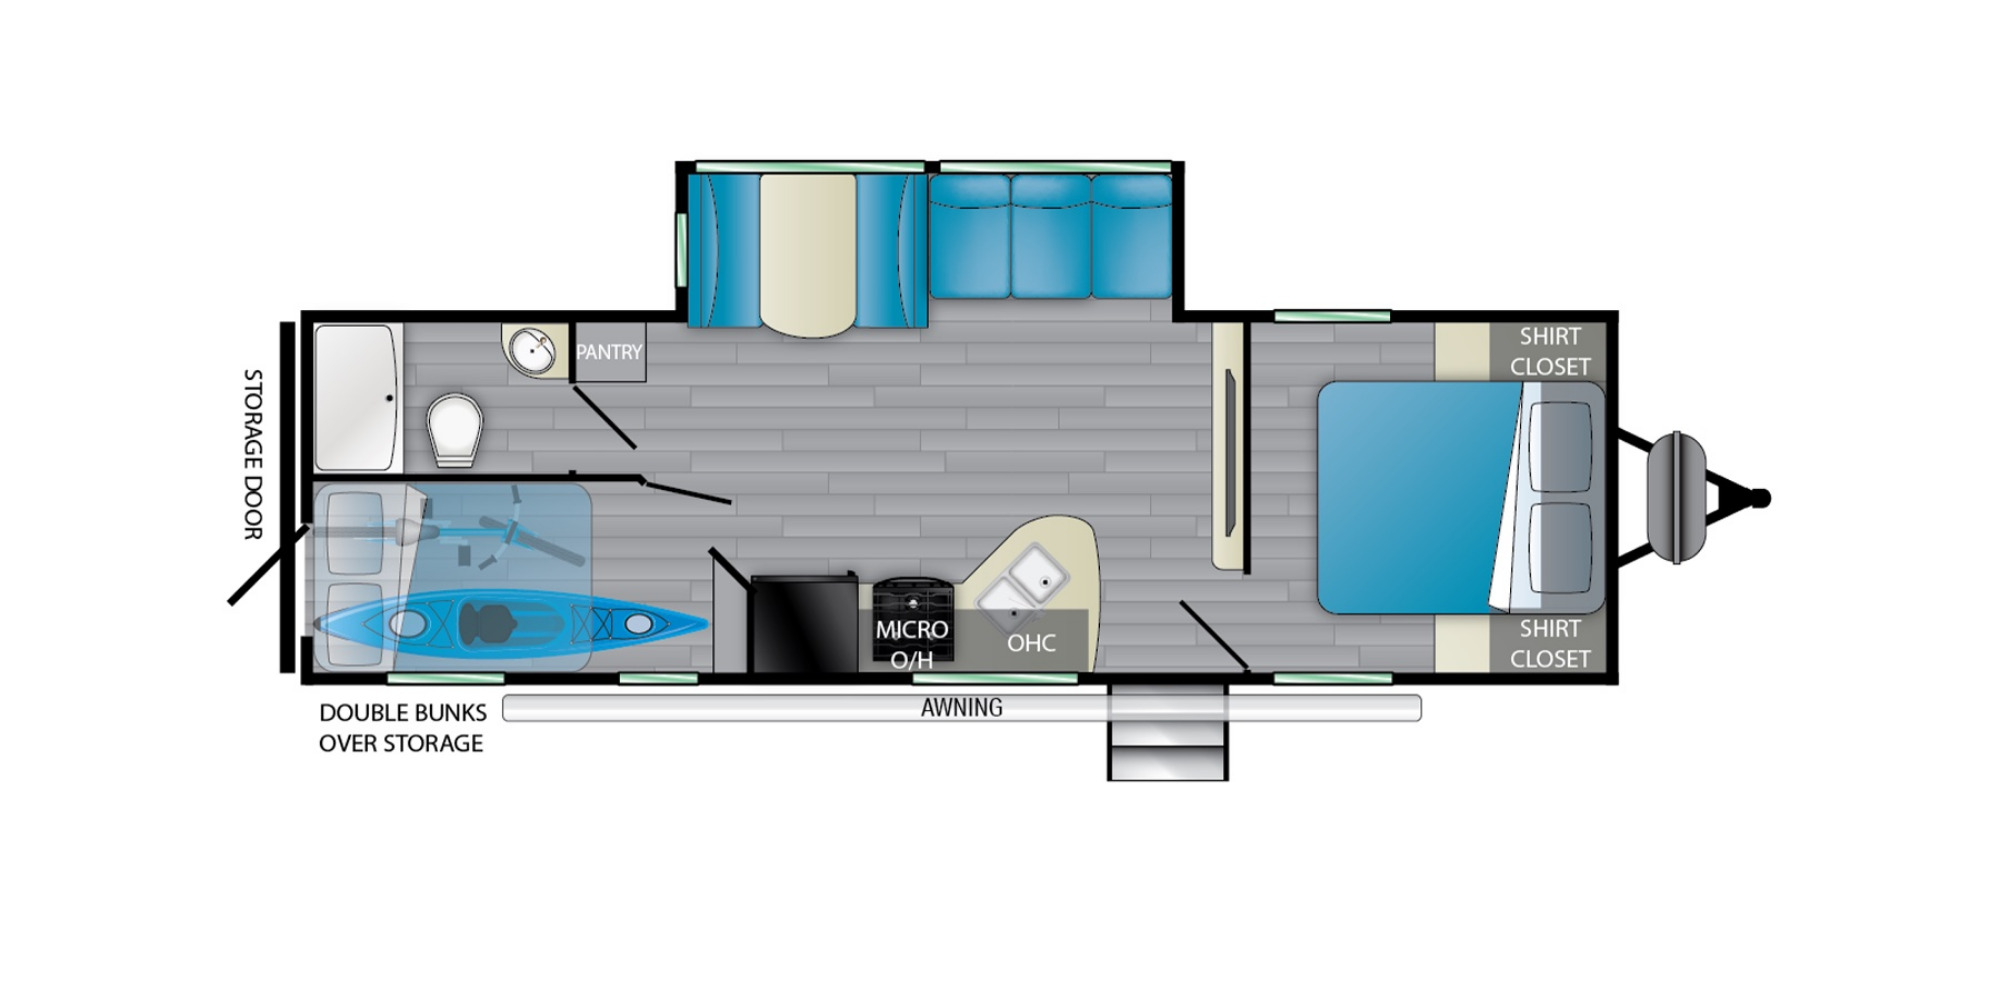 View Floor Plan for 2022 HEARTLAND PROWLER 271BR